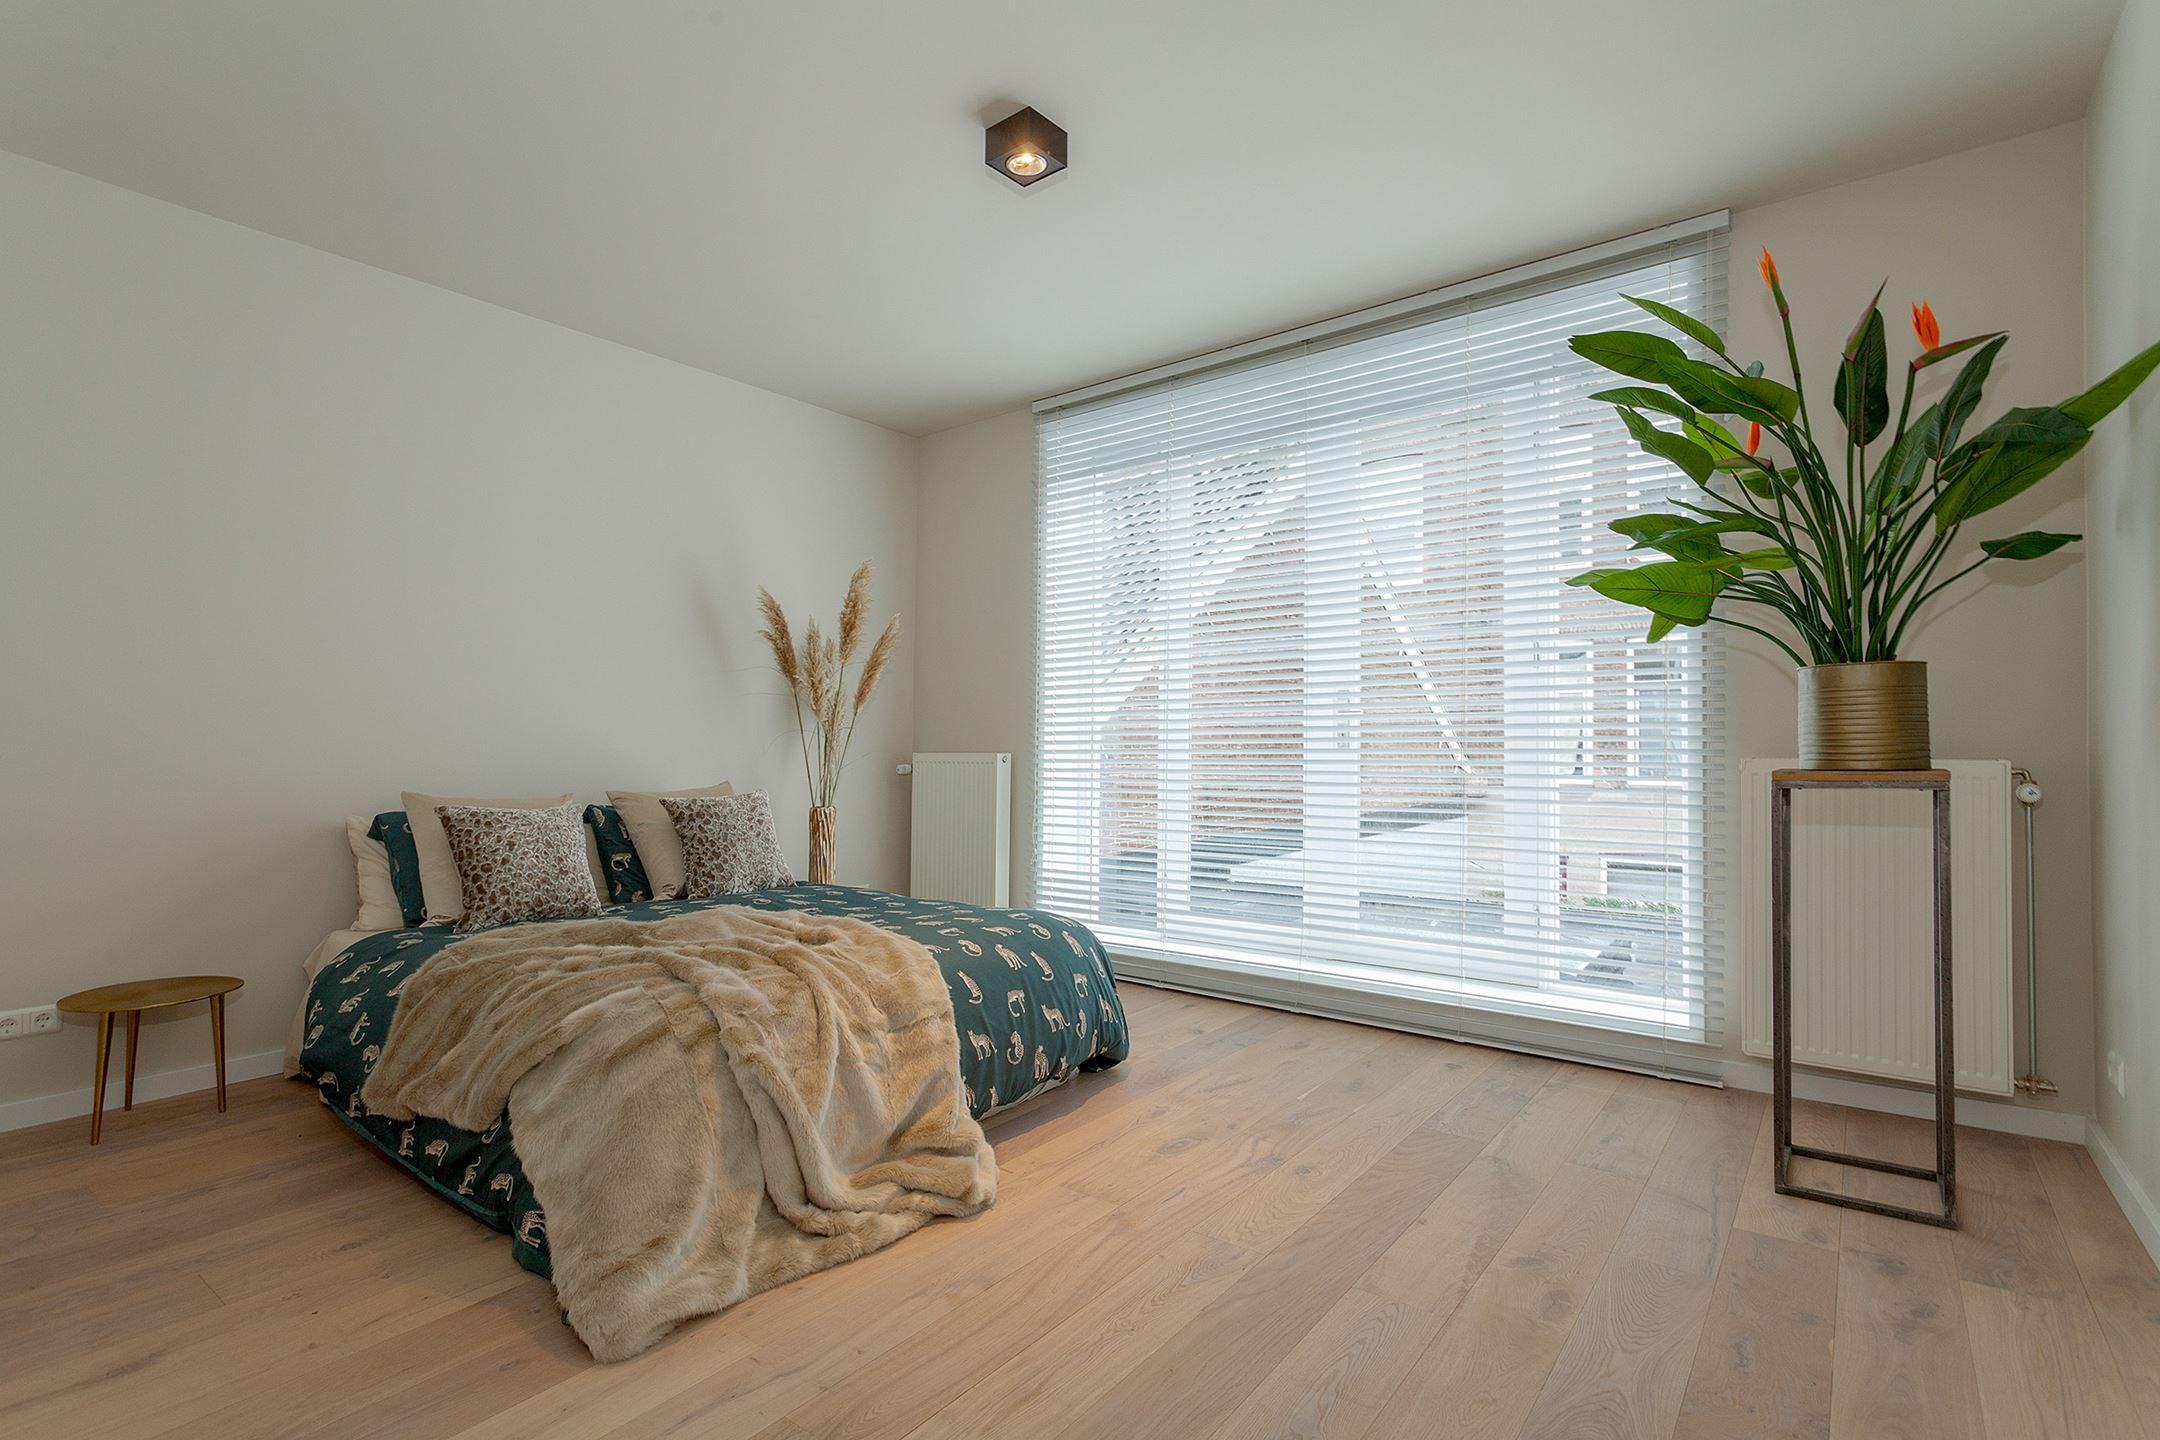 slaapkamer verbouwing renovatie rotterdam noordsingel